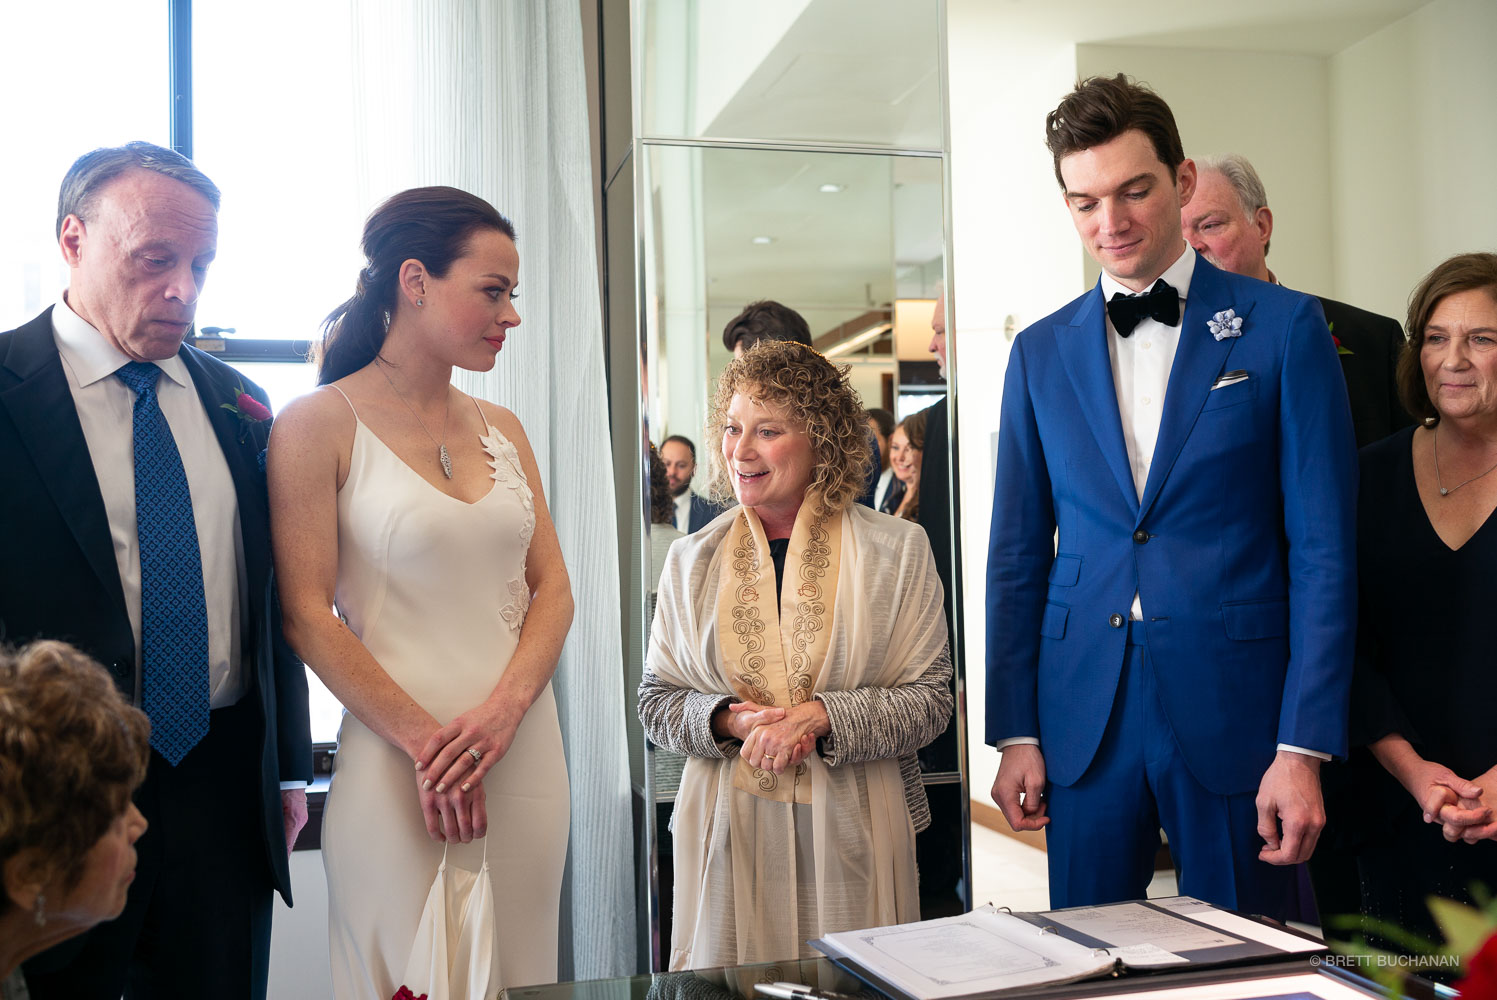 Austin-wedding-photographer-dallas-eyeball-joule-18